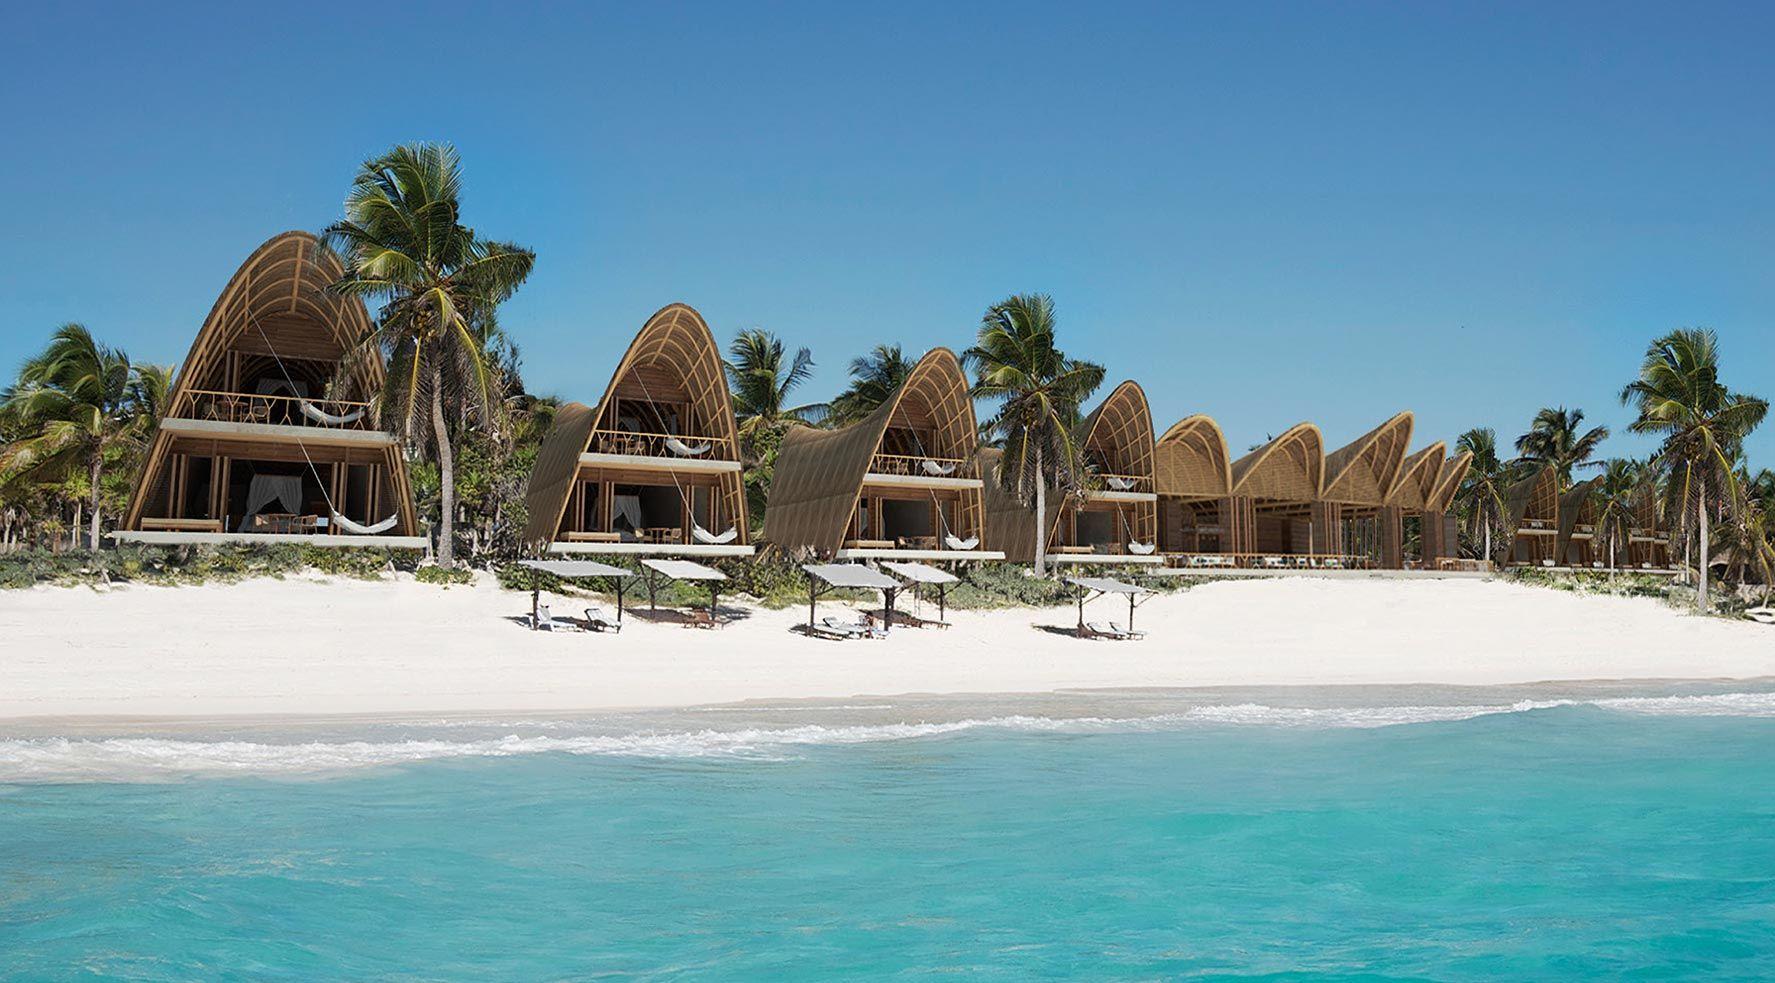 Las Ranitas Ecoboutique Hotel, Tulum, Quintana Roo Mexico